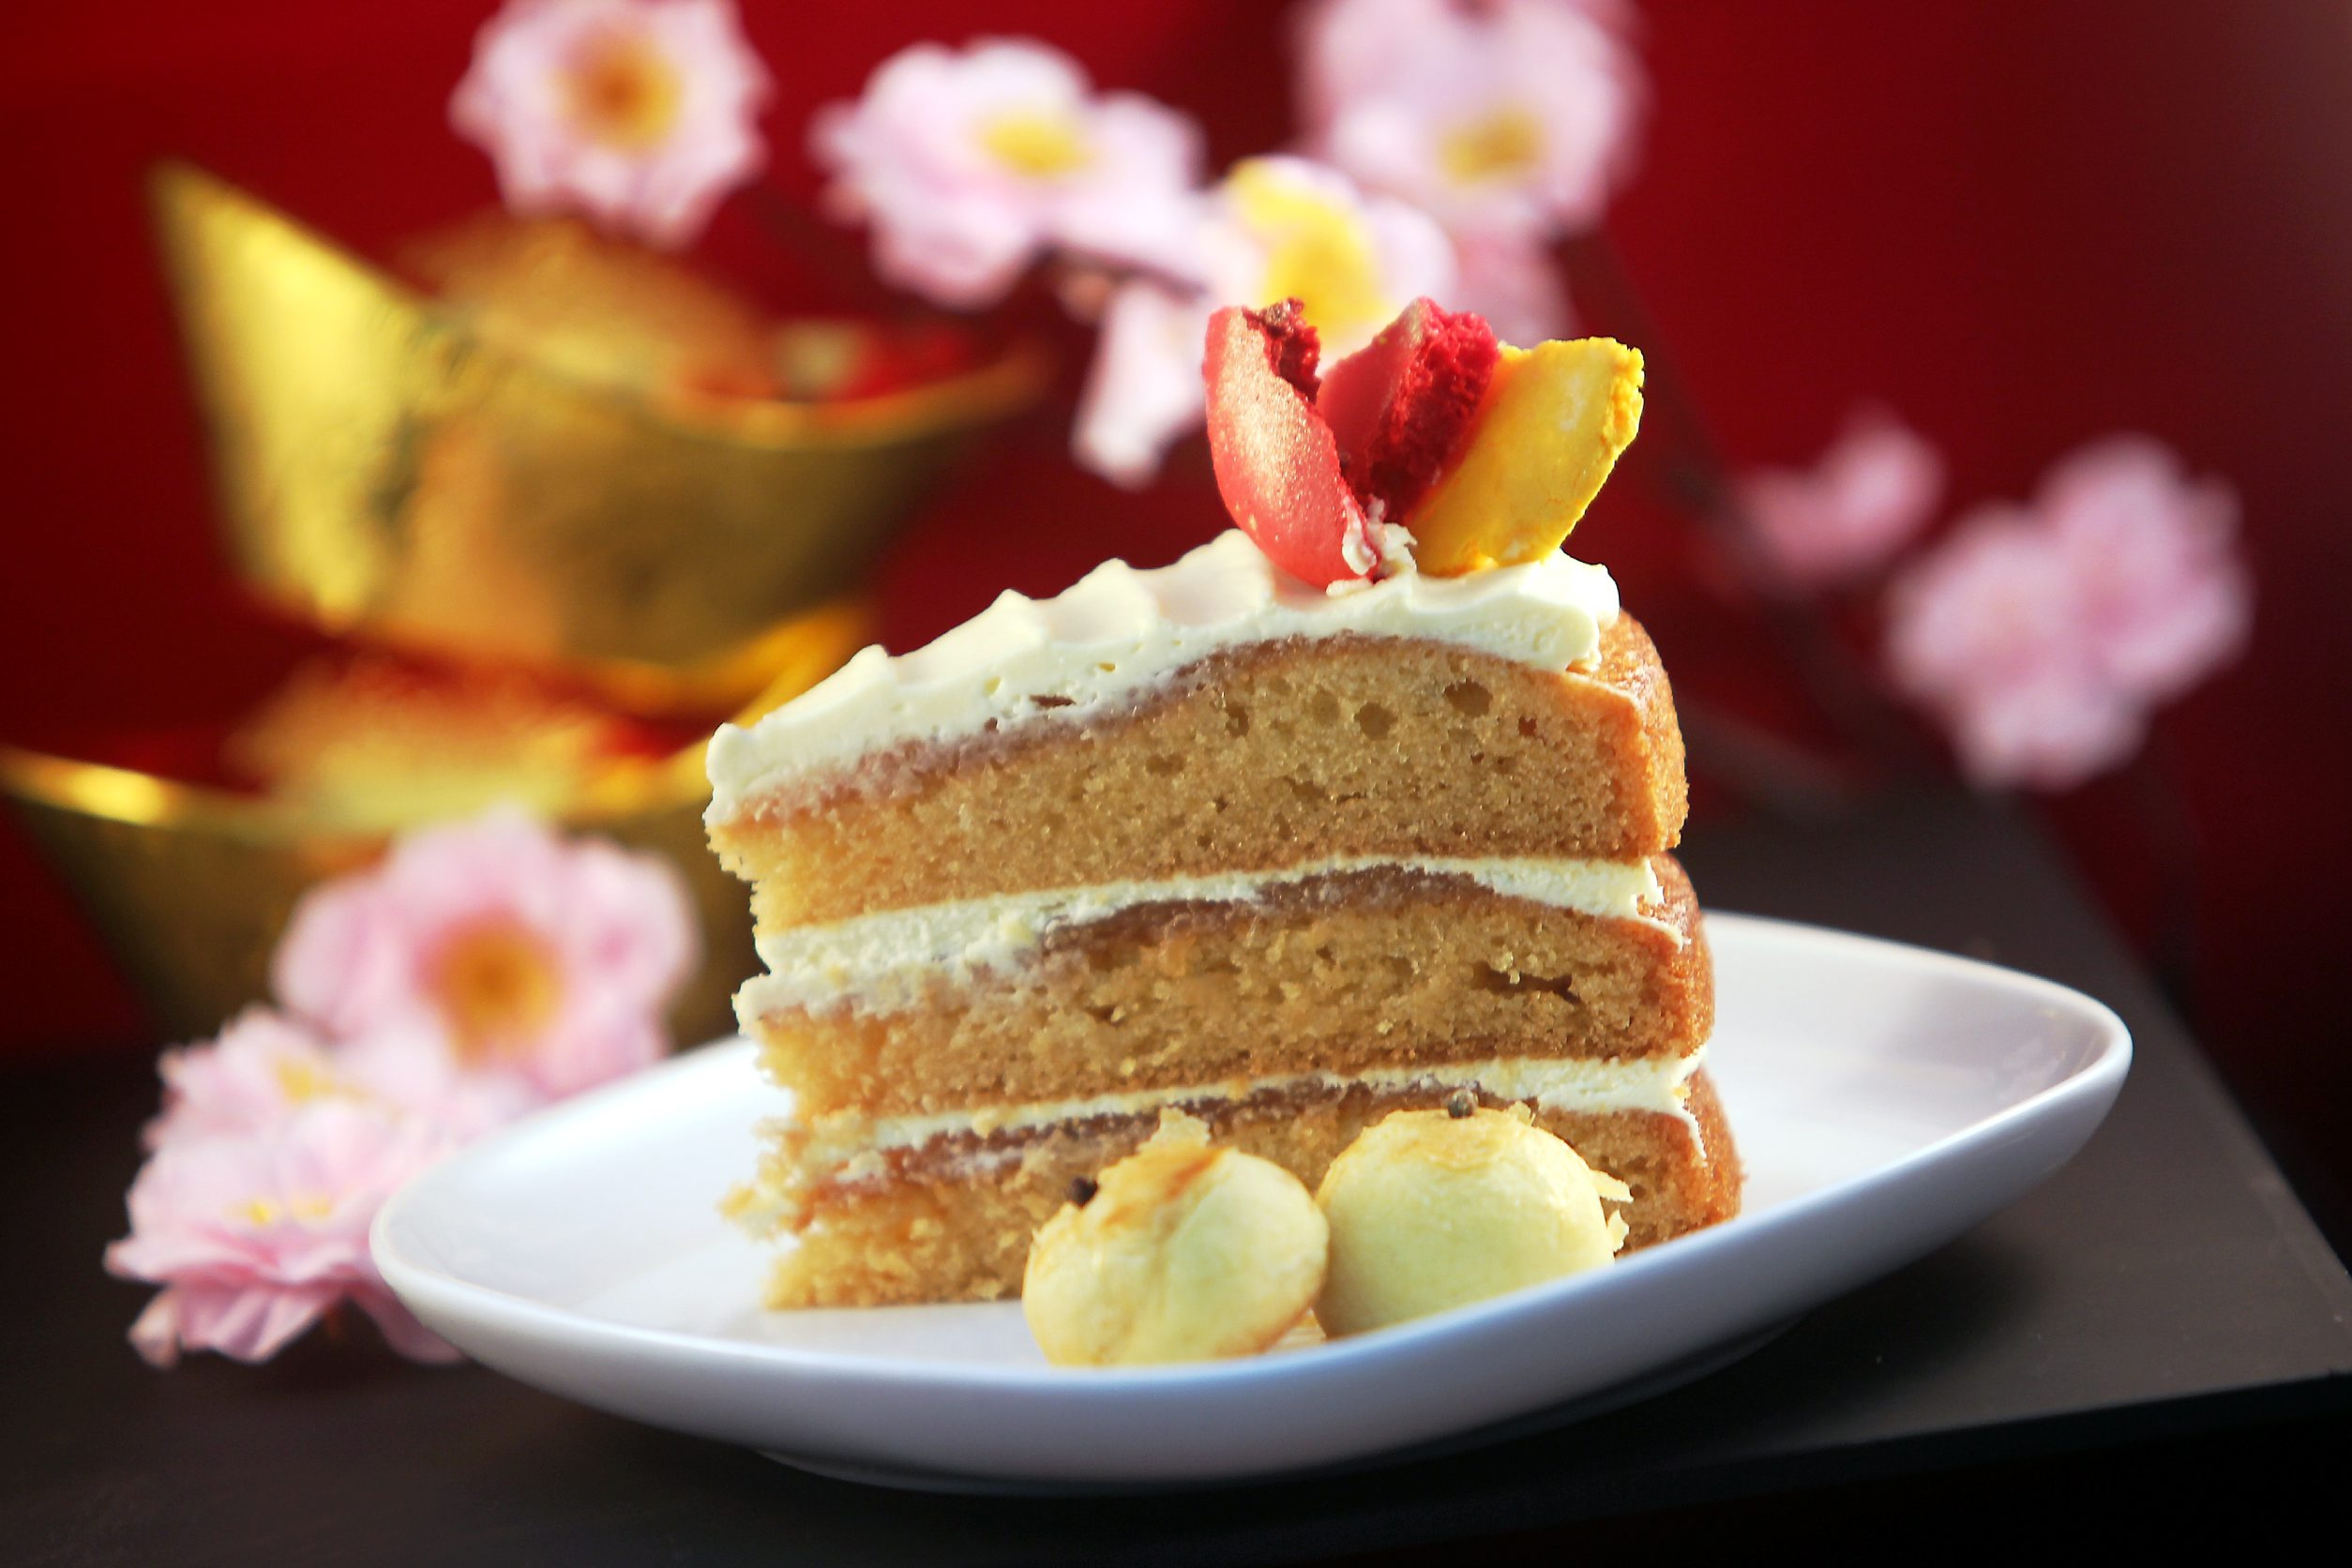 Kuali Com Butter Cake